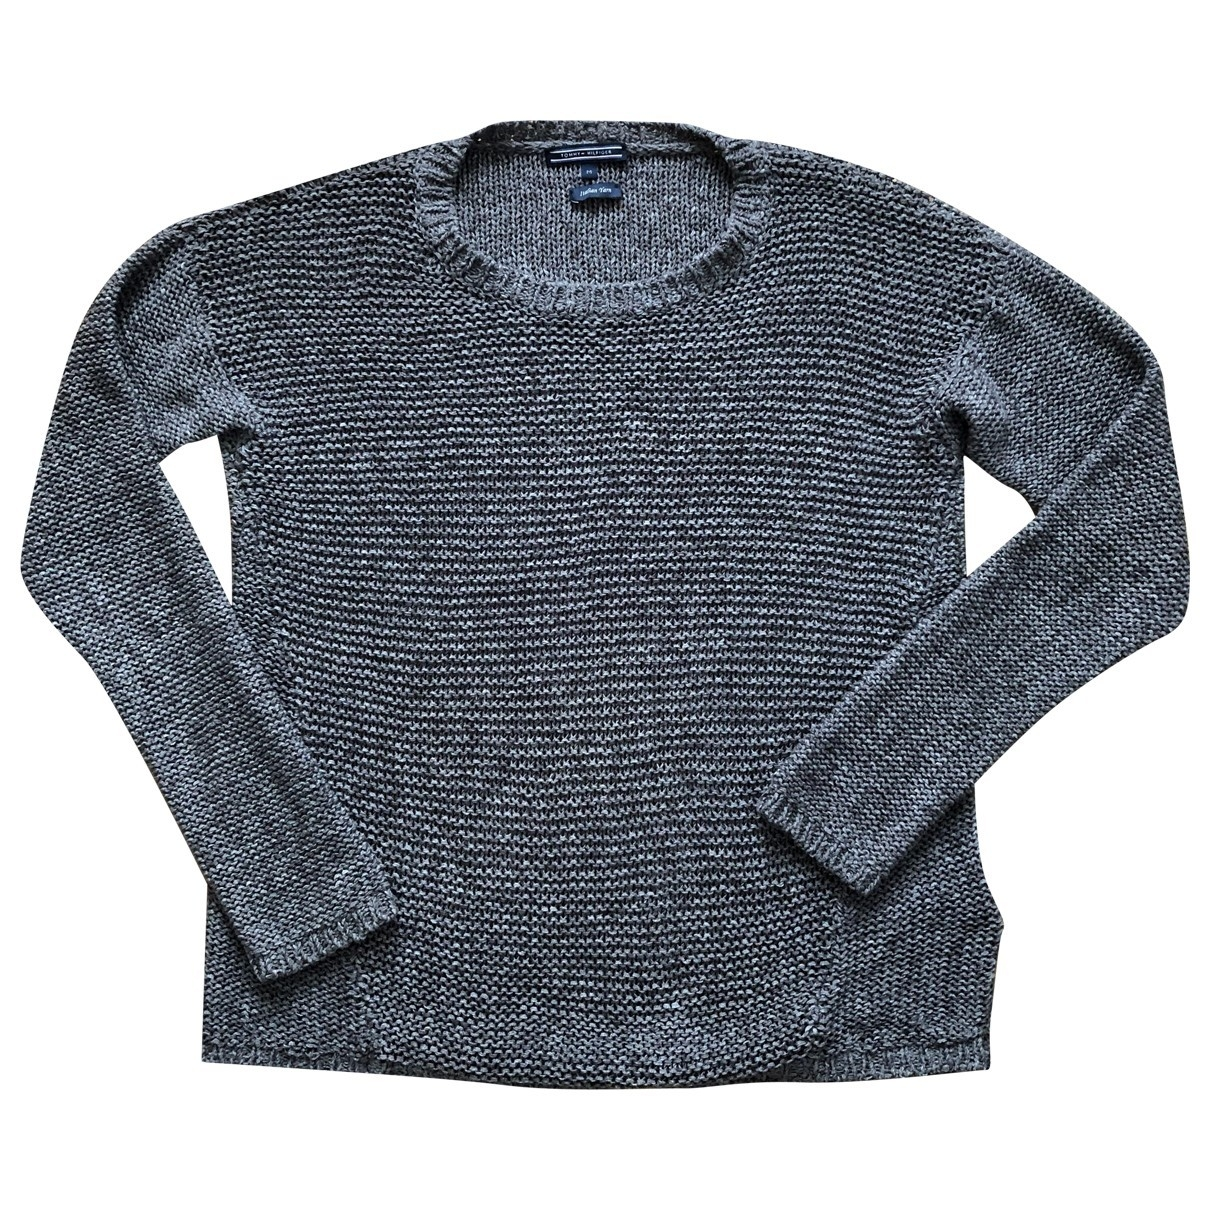 Tommy Hilfiger \N Anthracite Cotton Knitwear for Women M International